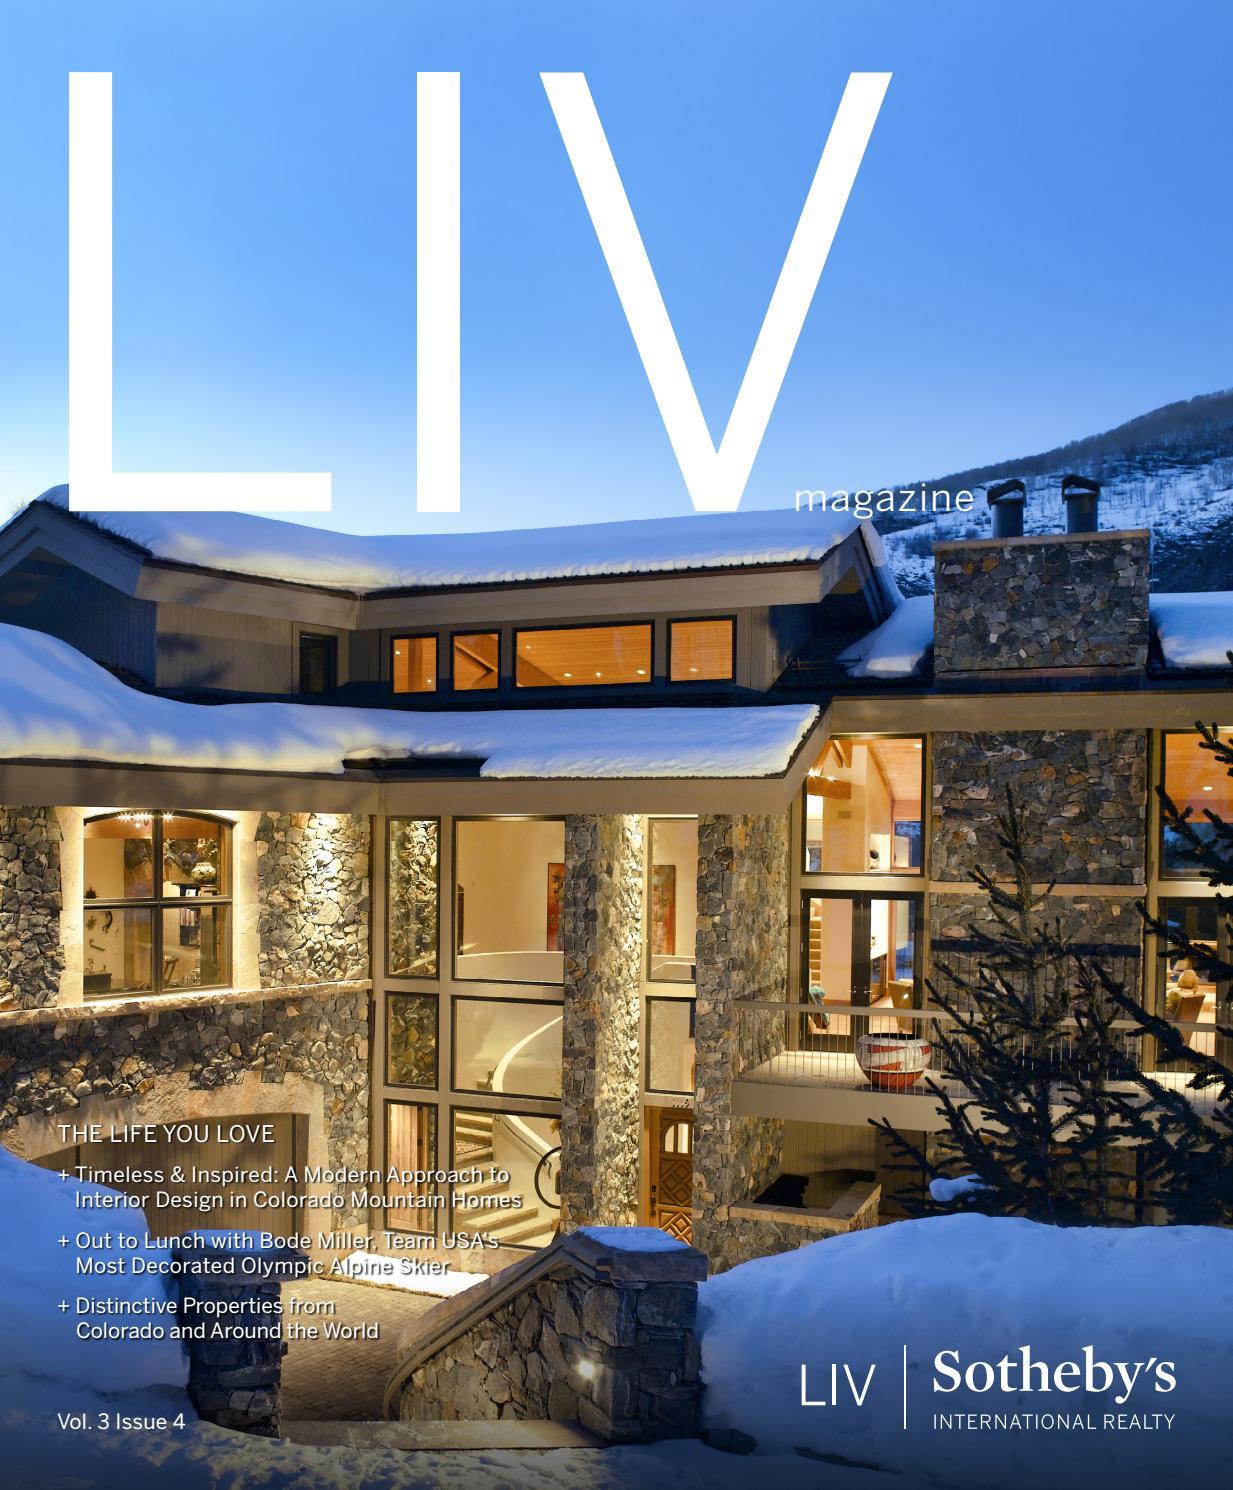 Superb LIV Magazine Vol 3 Issue 4 2017 By LIV Sothebyu0027s International Realty    Issuu